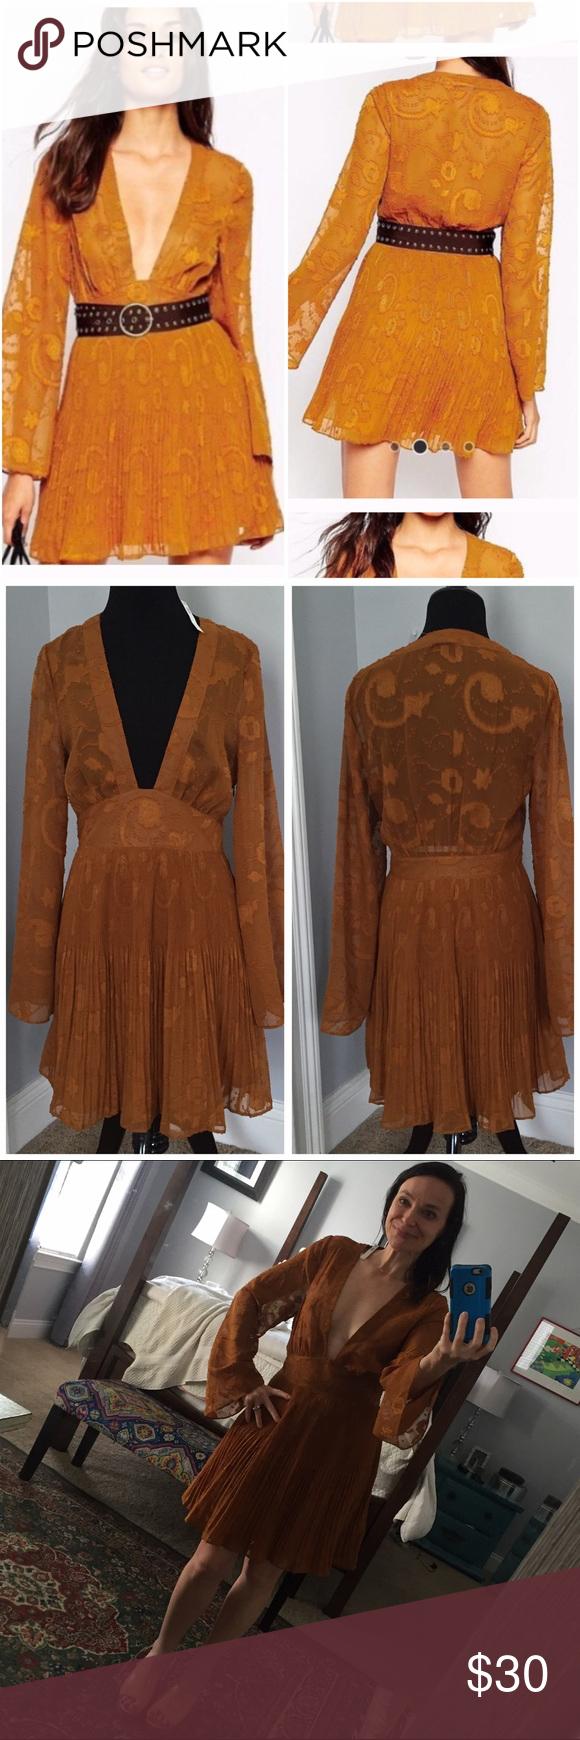 Selling this 🌺HOST PICK🌺 ASOS EMBROIDERED DEEP V PLUNGE DRESS on Poshmark! My username is: democracy21. #shopmycloset #poshmark #fashion #shopping #style #forsale #ASOS #Dresses & Skirts